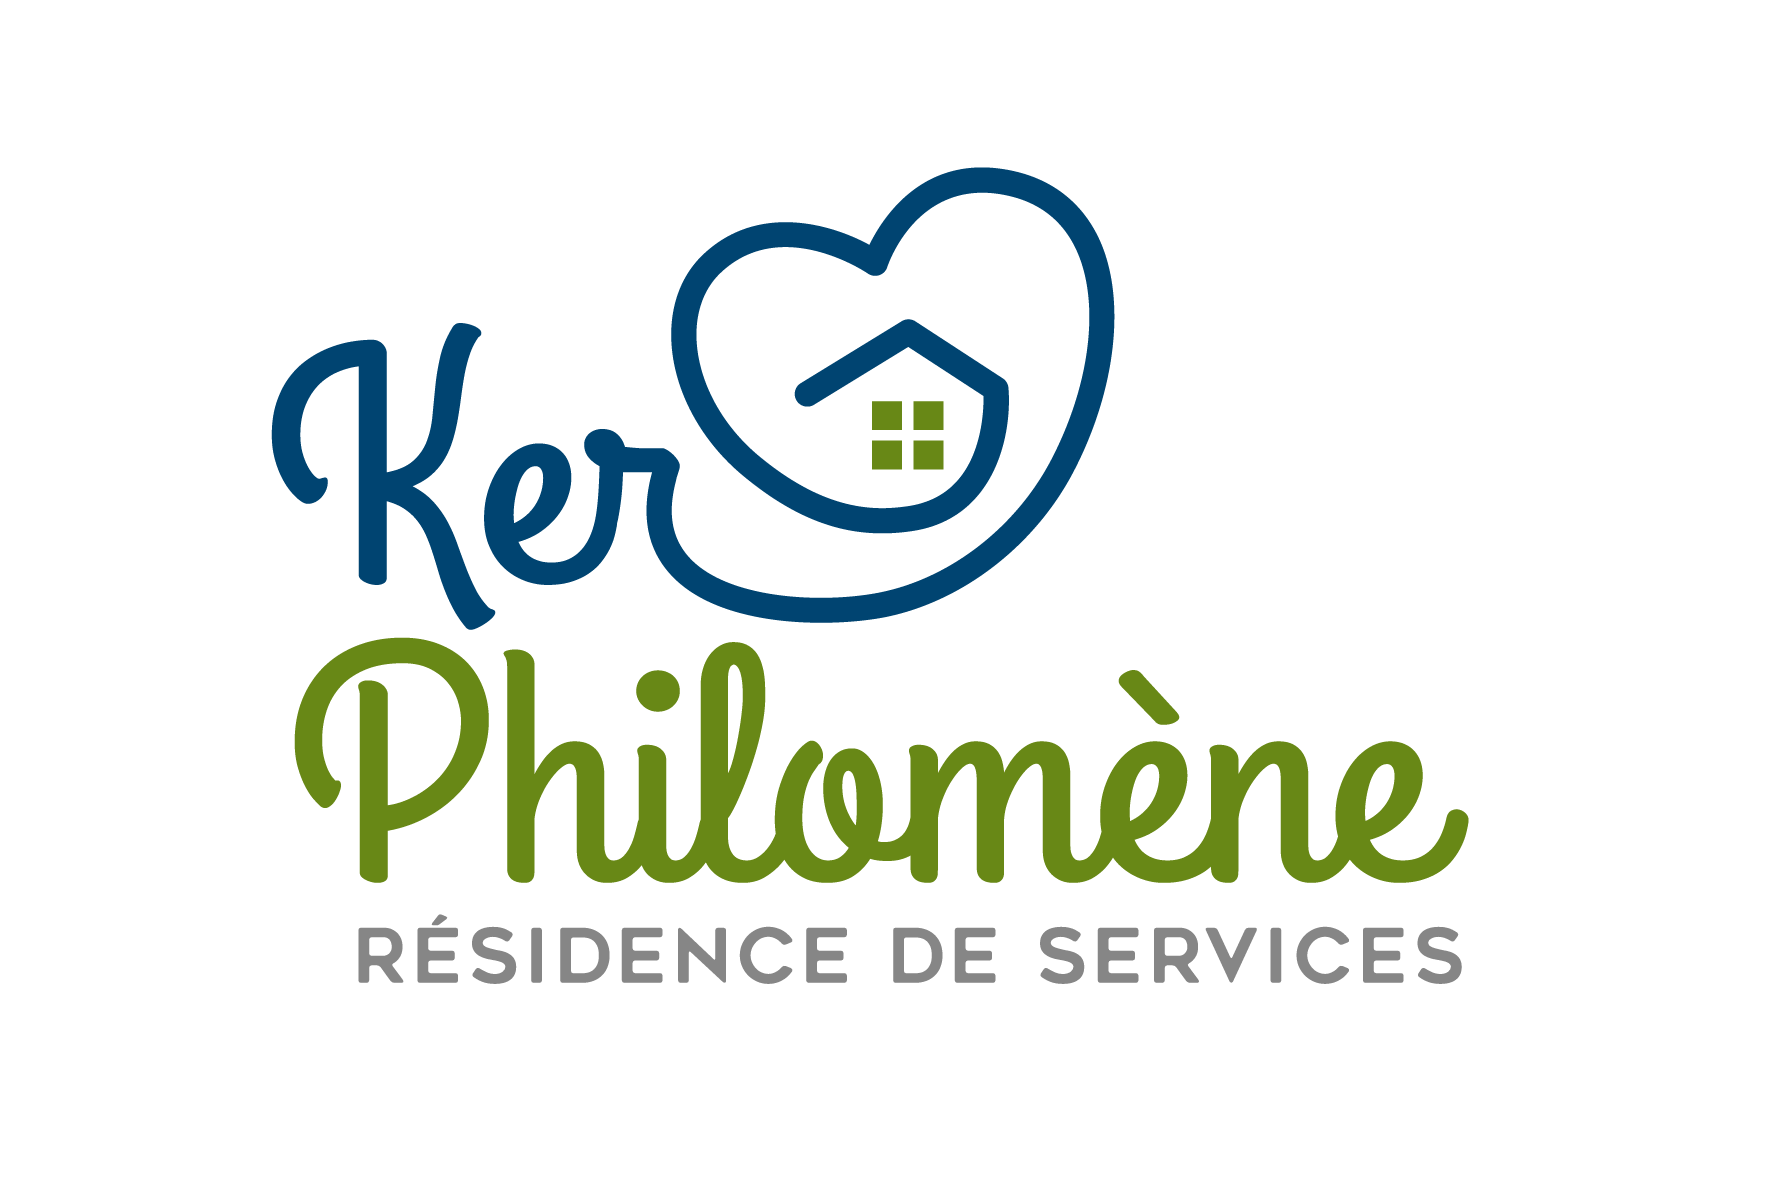 Logo_KerPhilomene